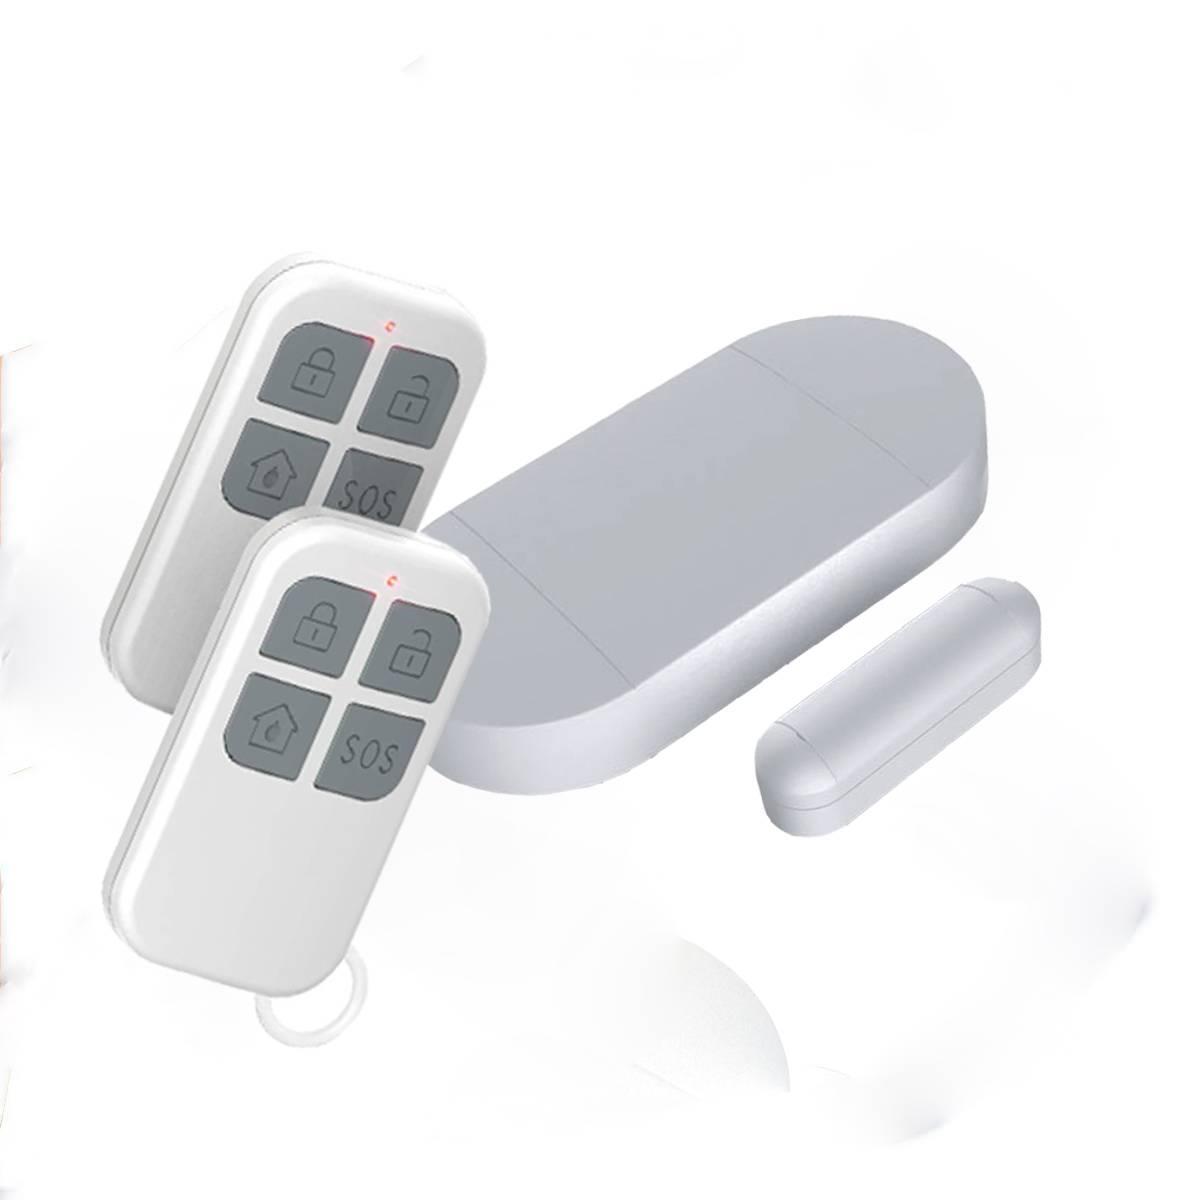 China Hot New Products Door Lock Alarm Key - Wireless Home ...